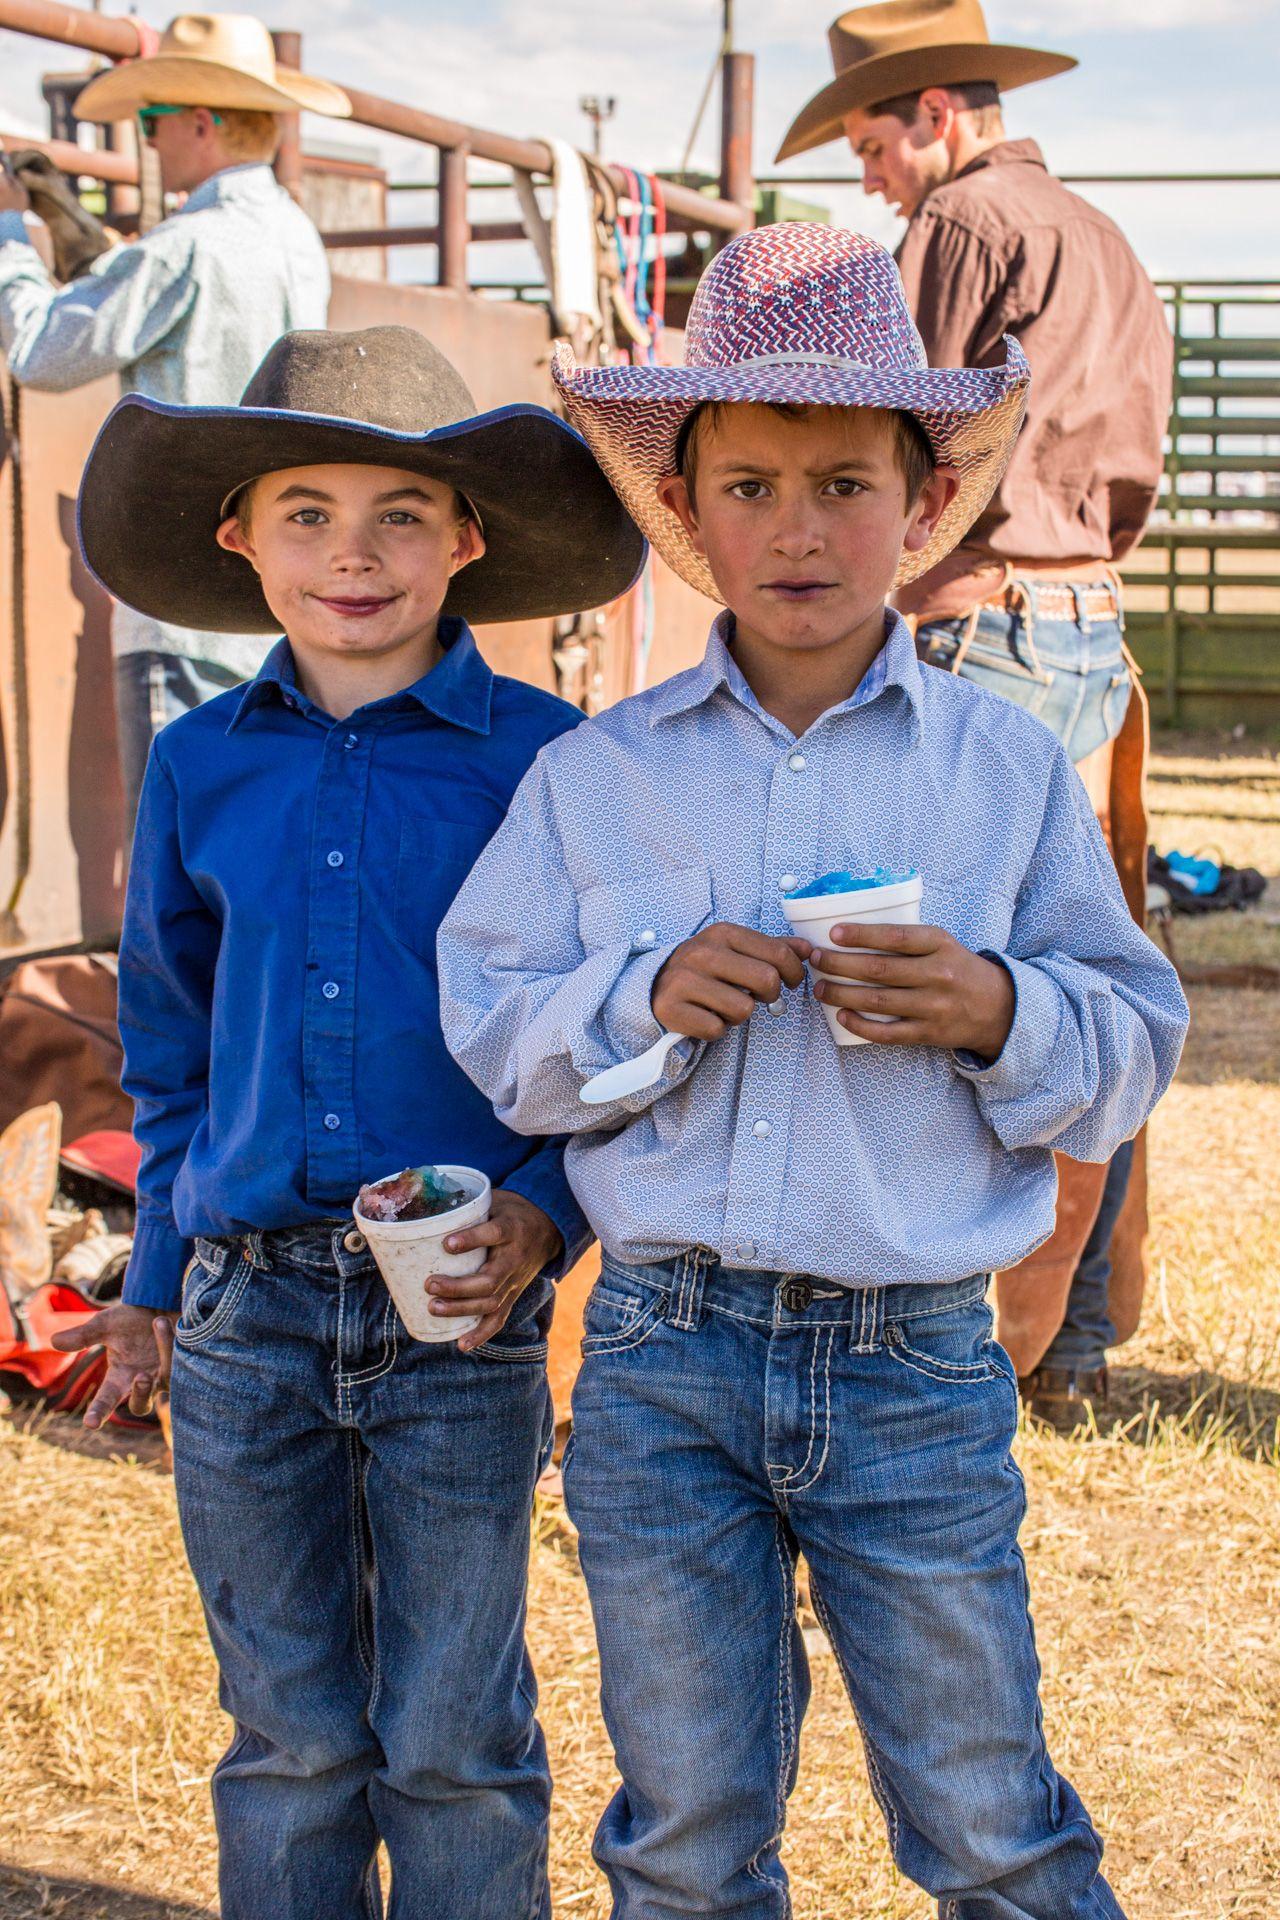 Future Cowboys of America, Ennis Montana